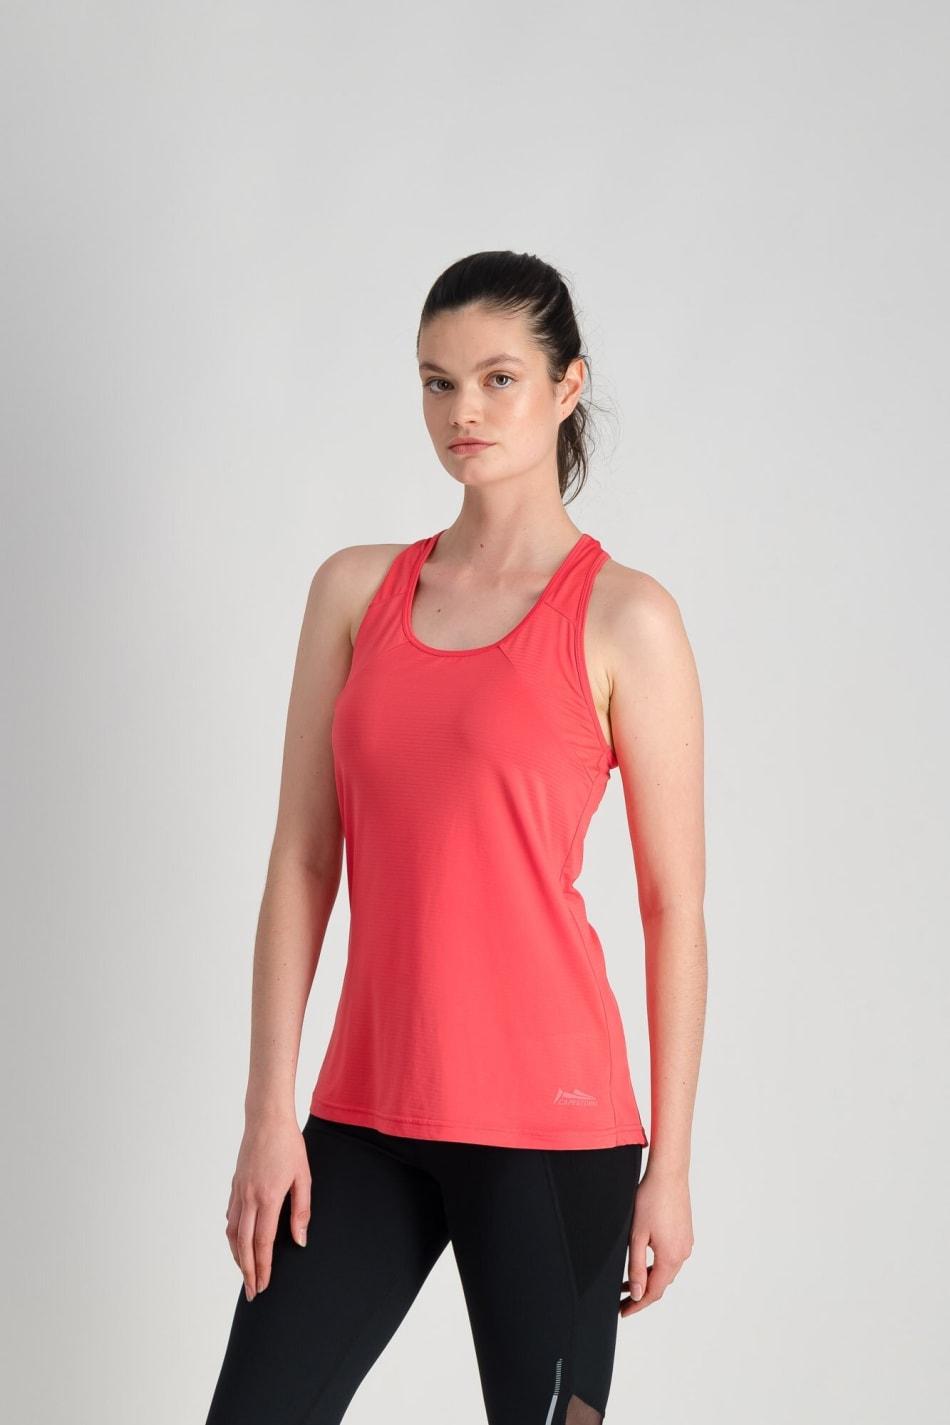 Capestorm Women's Stride Run Vest, product, variation 2